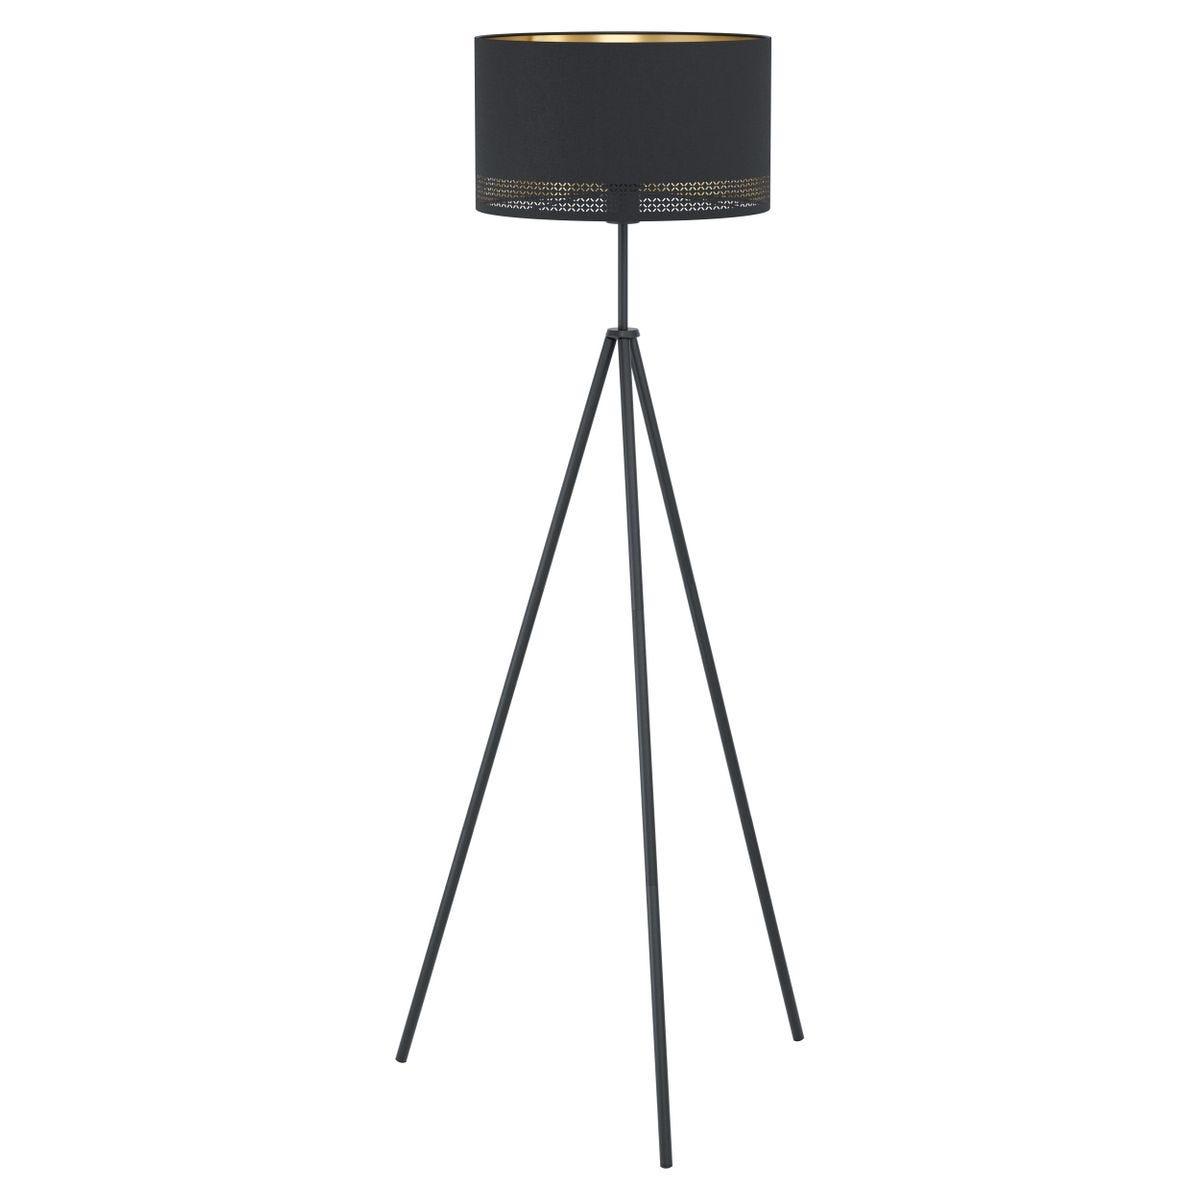 Eglo Esteperra Tripod Black and Gold Floor Lamp